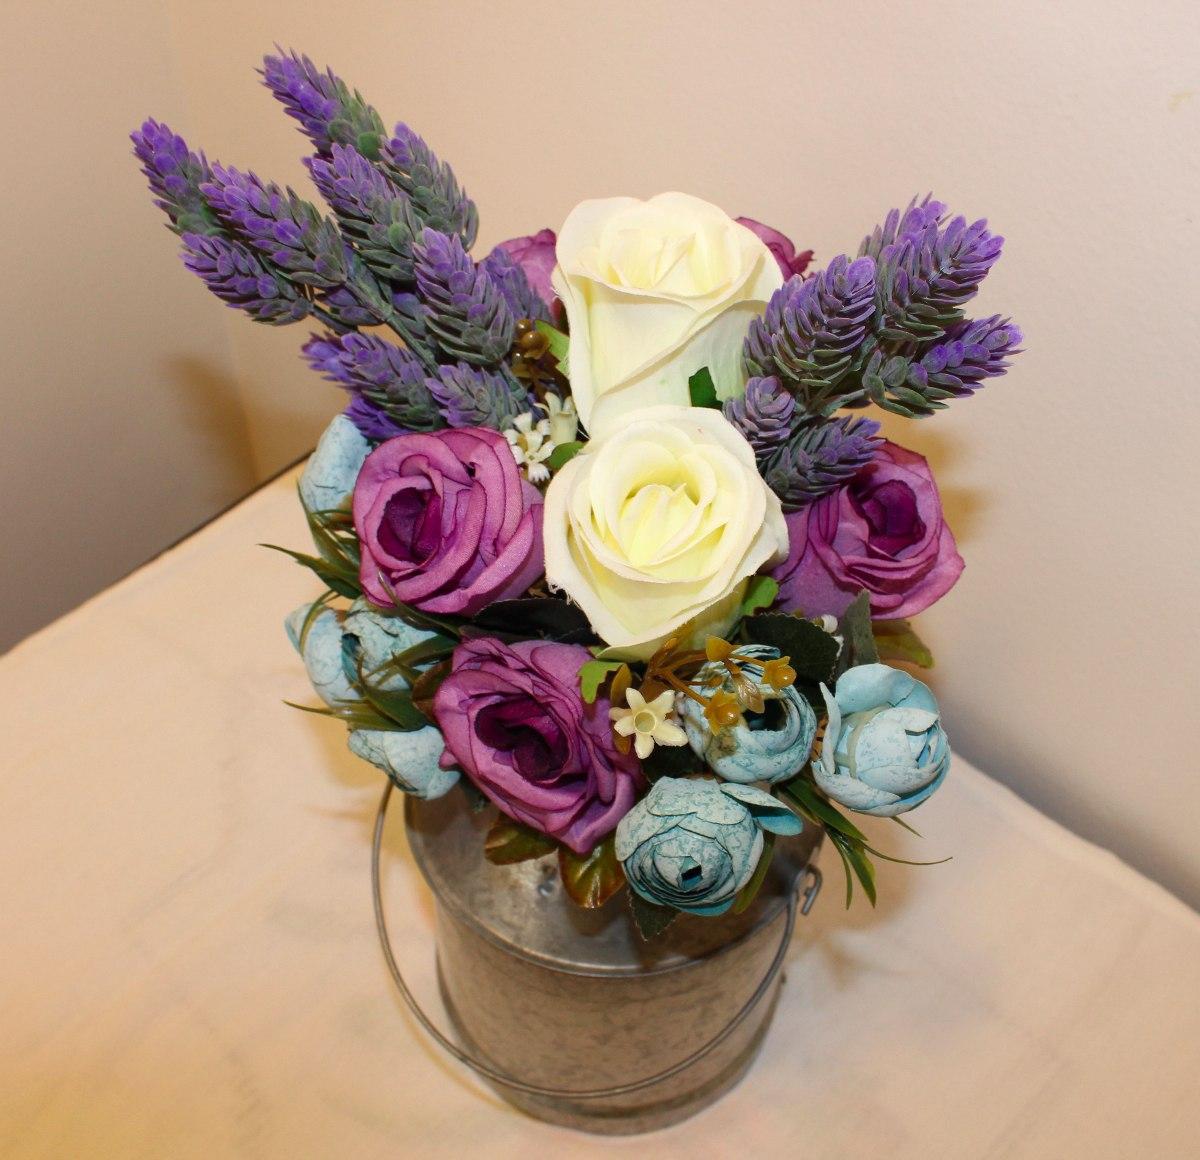 Arreglo floral centro de mesa flores artificiales lechero 39900 arreglo floral centro de mesa flores artificiales lechero cargando zoom altavistaventures Image collections